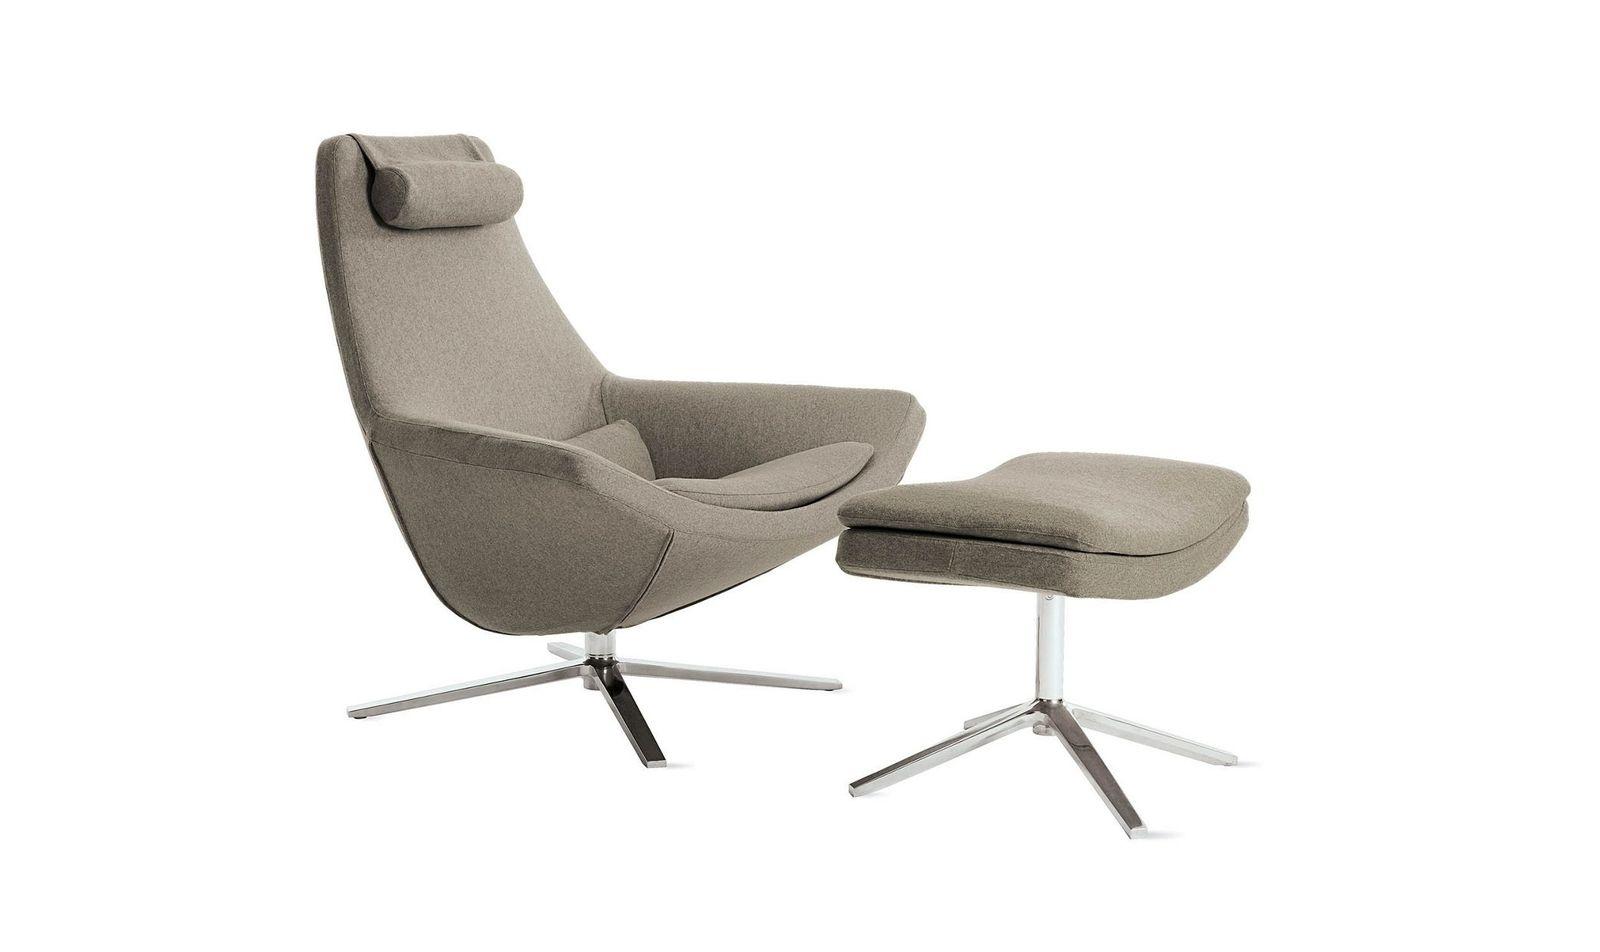 B B Italia Metropolitan Me100 1 Naoto Fukasawa Sessel Woont Love Your Home Chair And Ottoman Modern Lounge Chairs Eames Lounge Chair